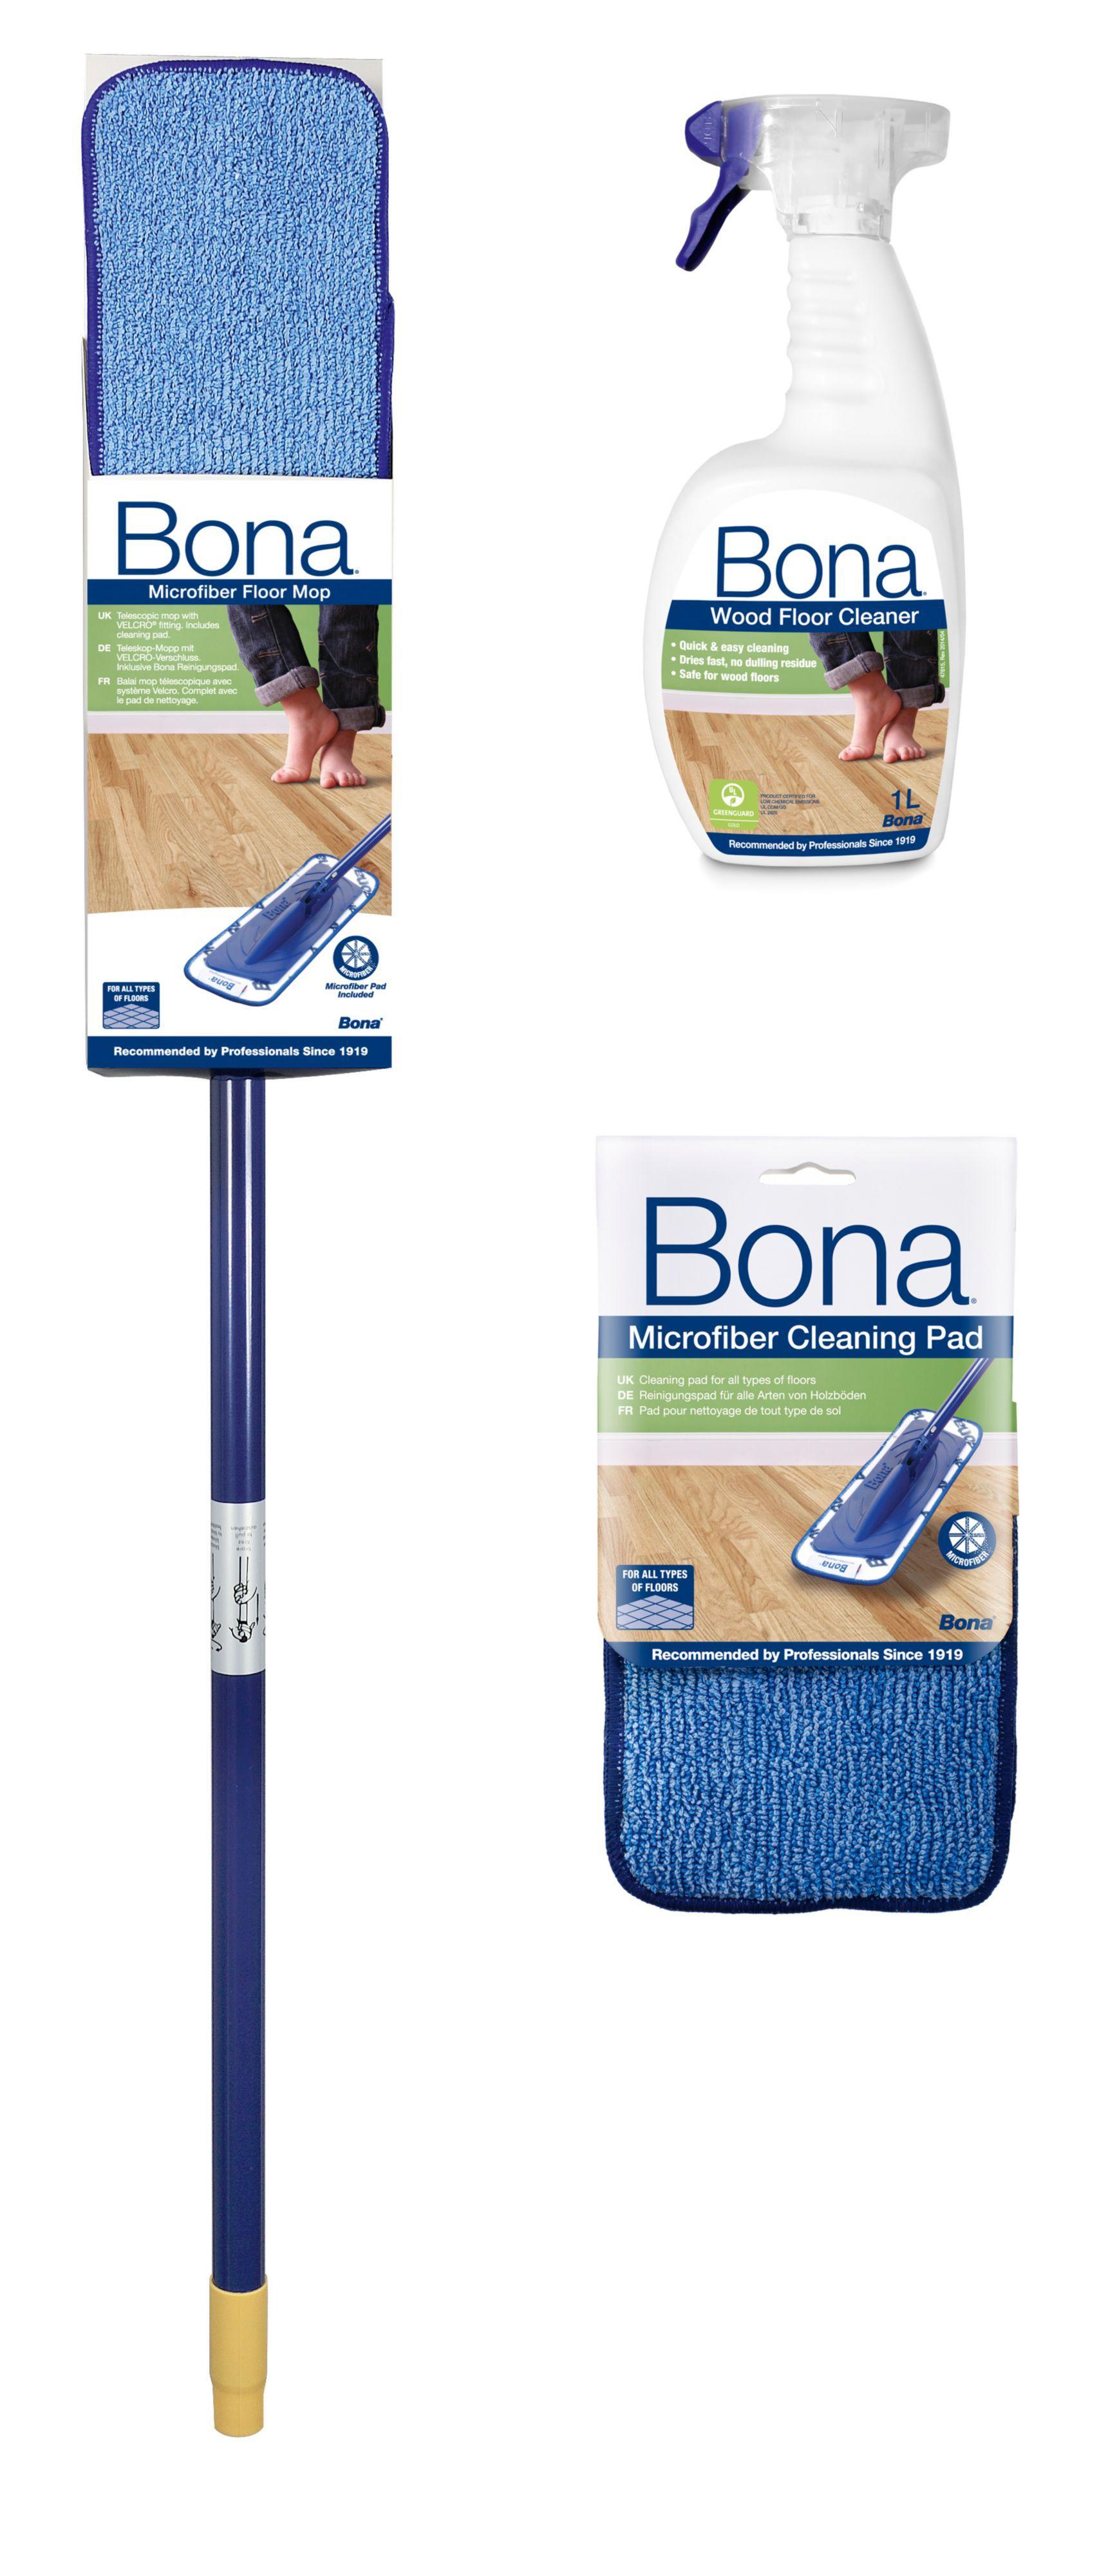 bona wood floor mop cleaning kit departments diy at b q. Black Bedroom Furniture Sets. Home Design Ideas